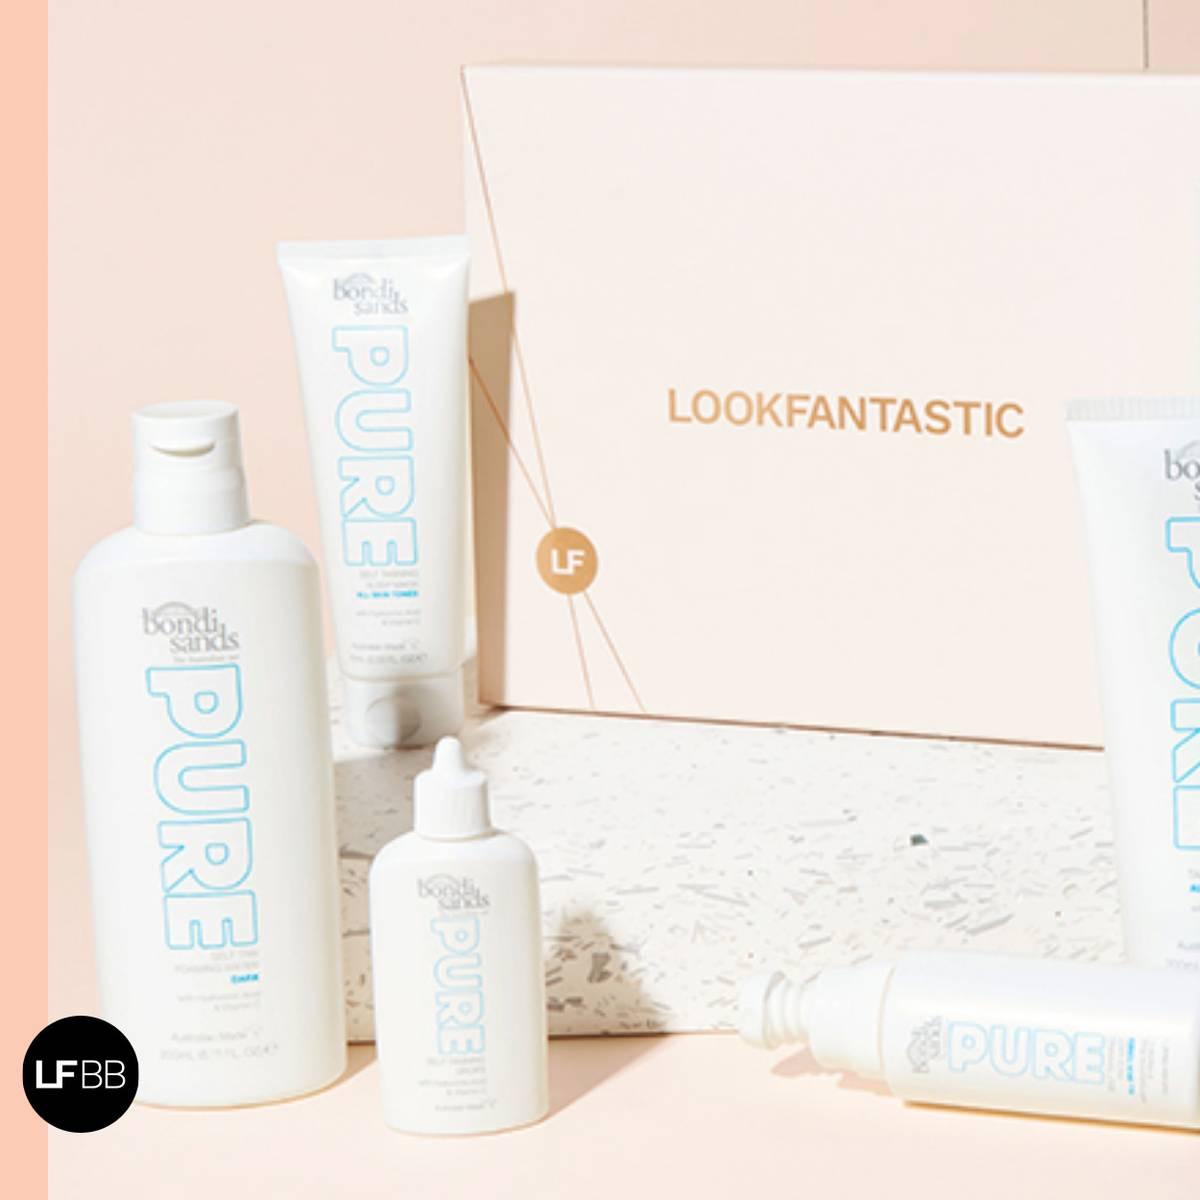 LOOKFANTASTIC x Bondi Sands Beauty Box